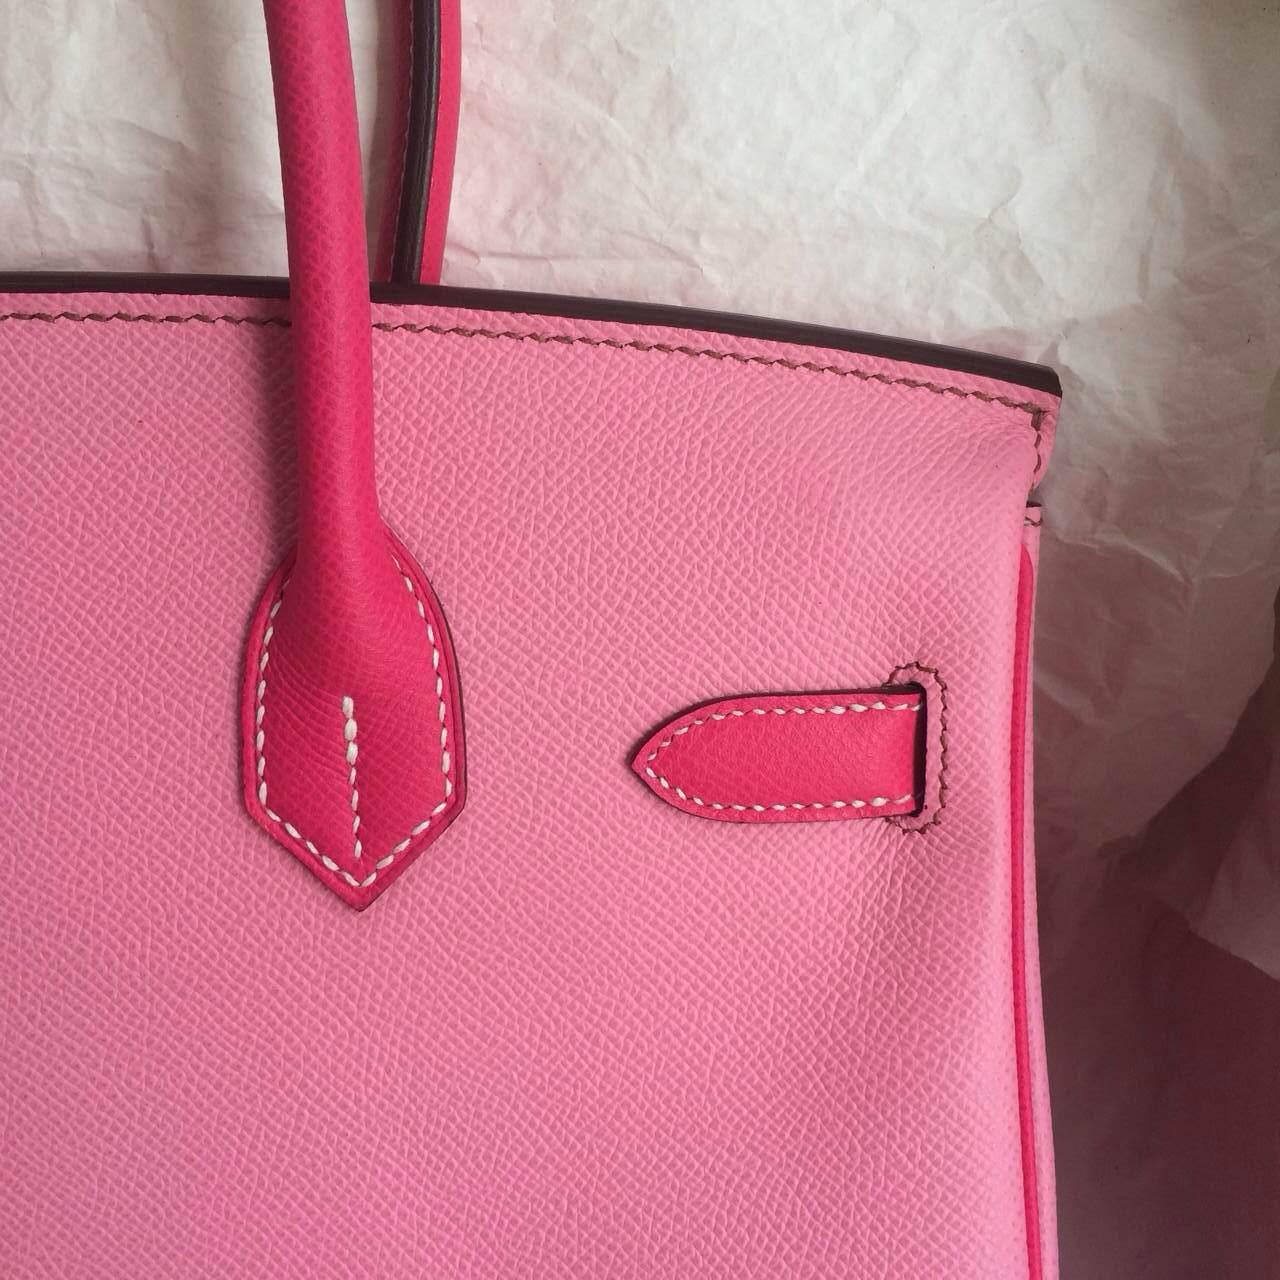 5P Pink/E5 Rose Tyrien Epsom Leather Hermes Birkin Bag 30cm Women's Tote Bag